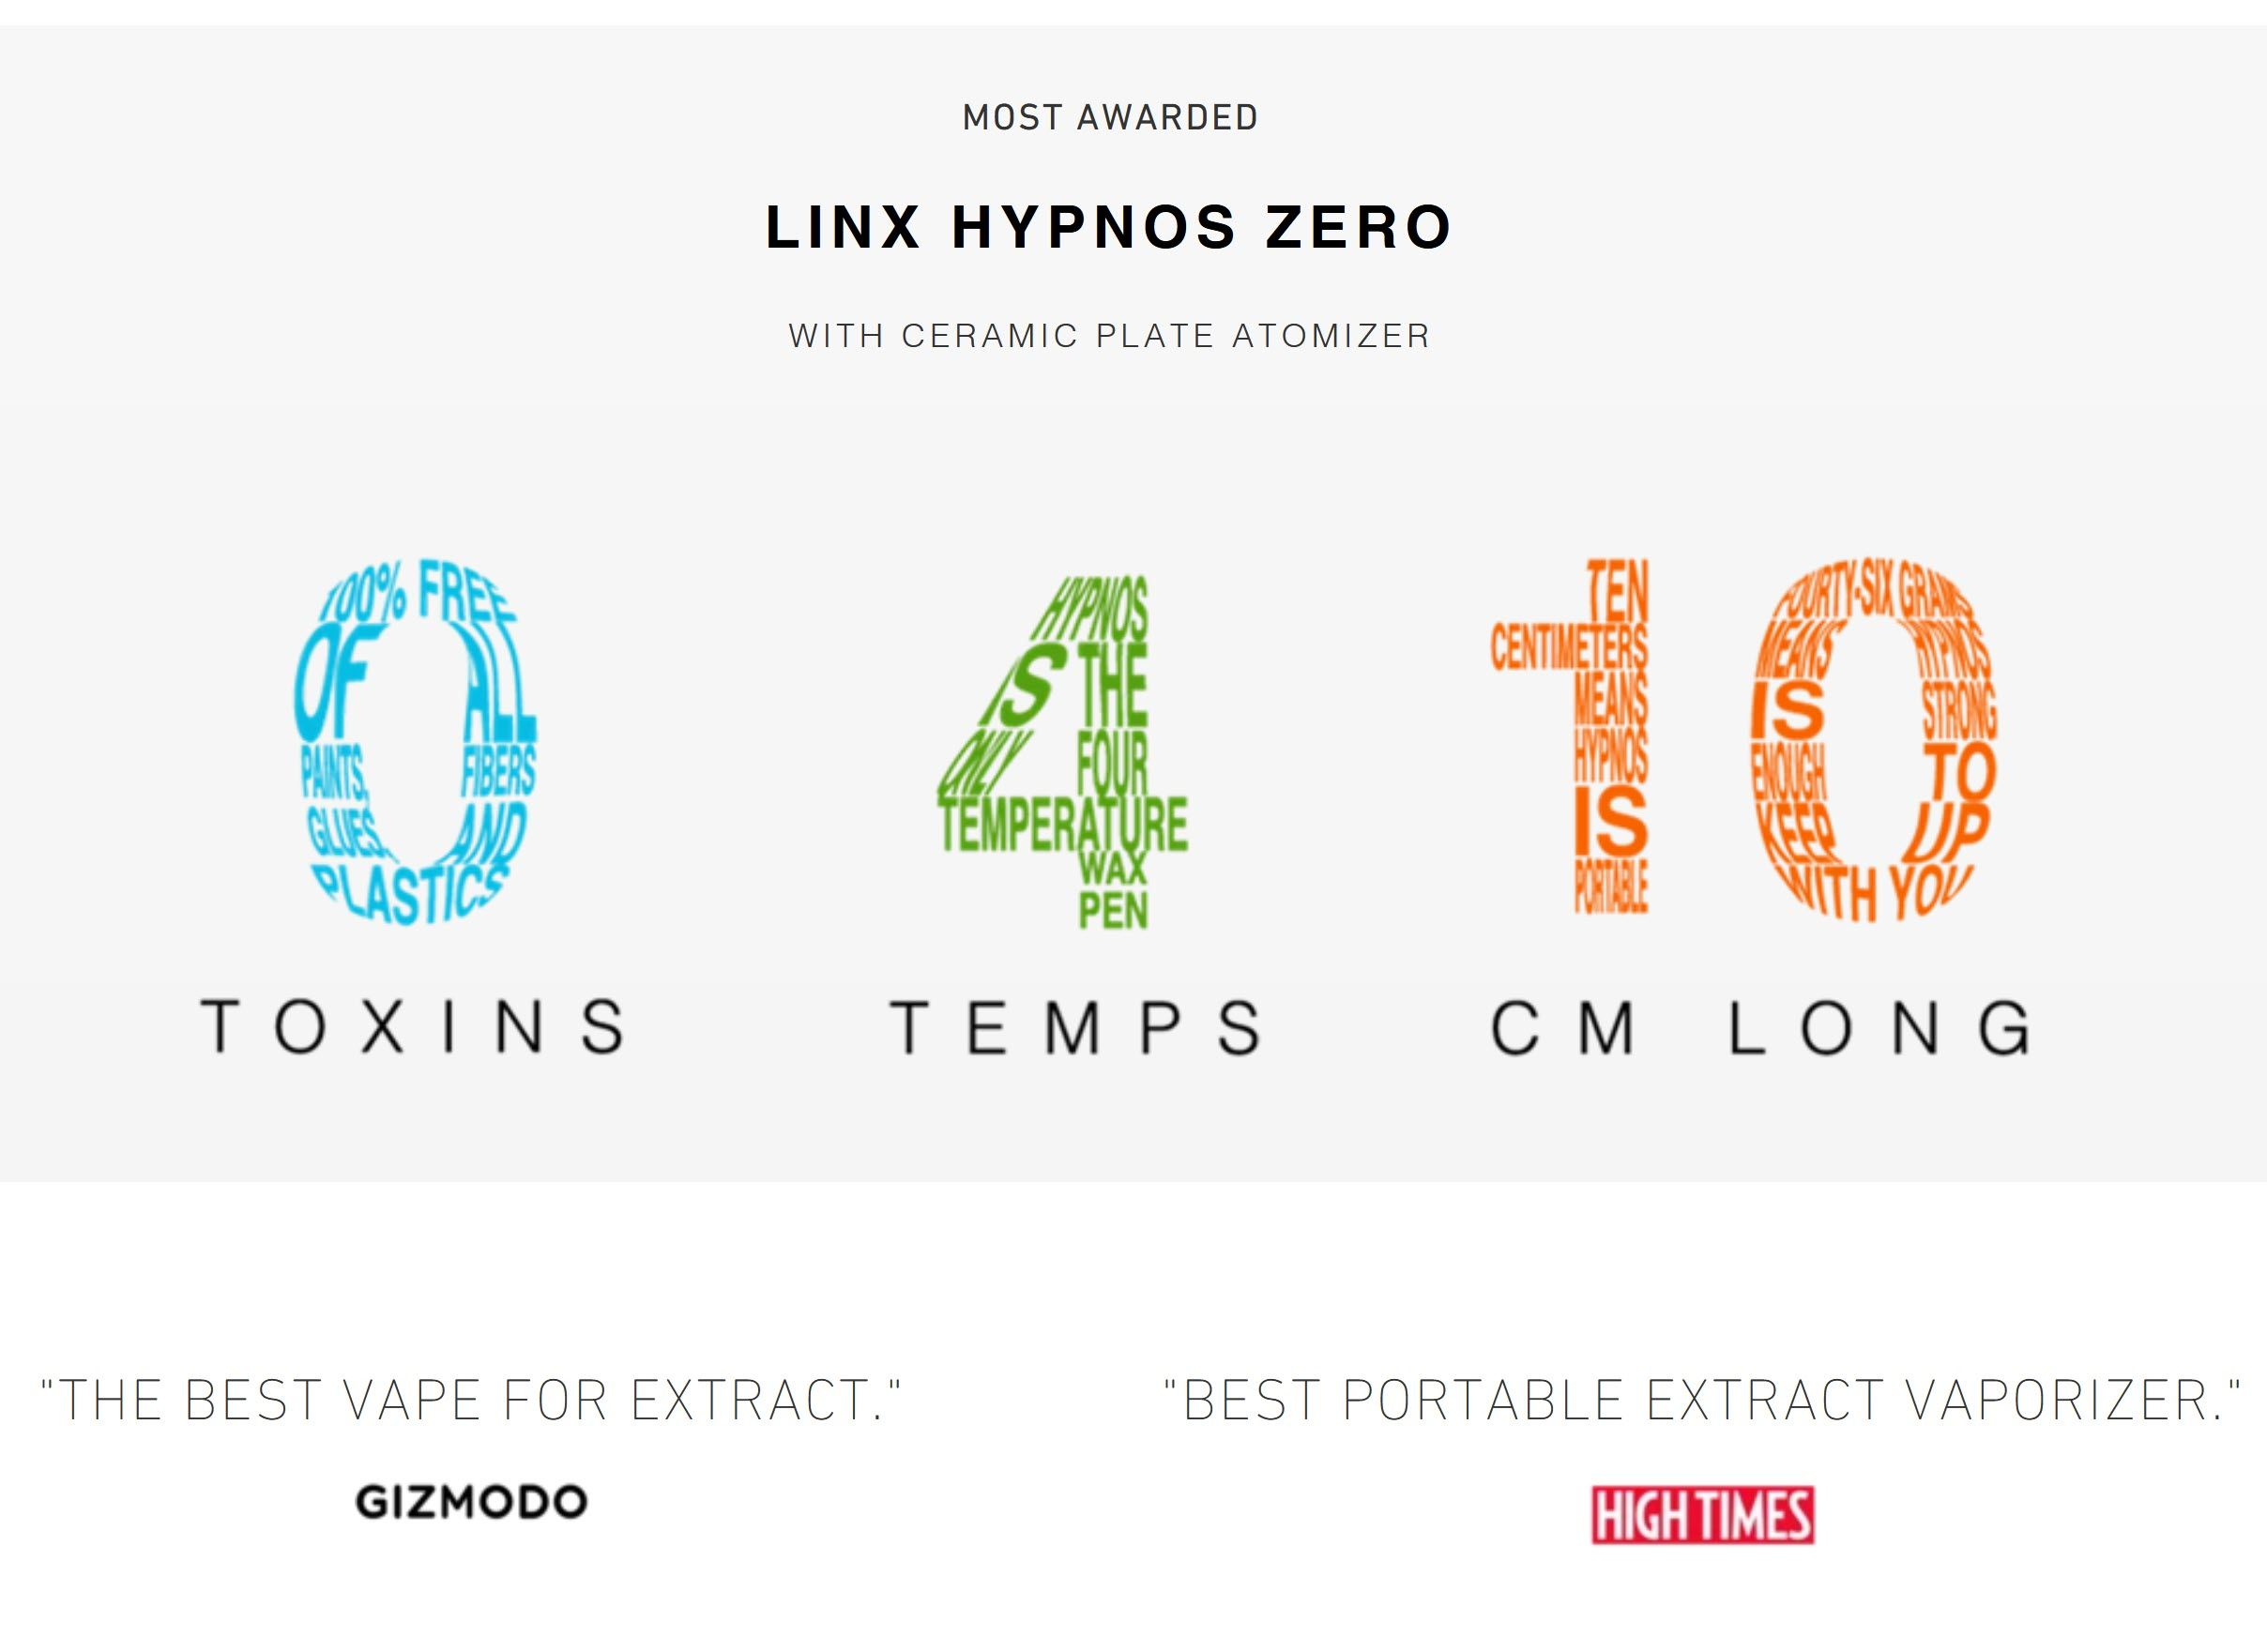 Linx Hypnos Zero High Times Winner